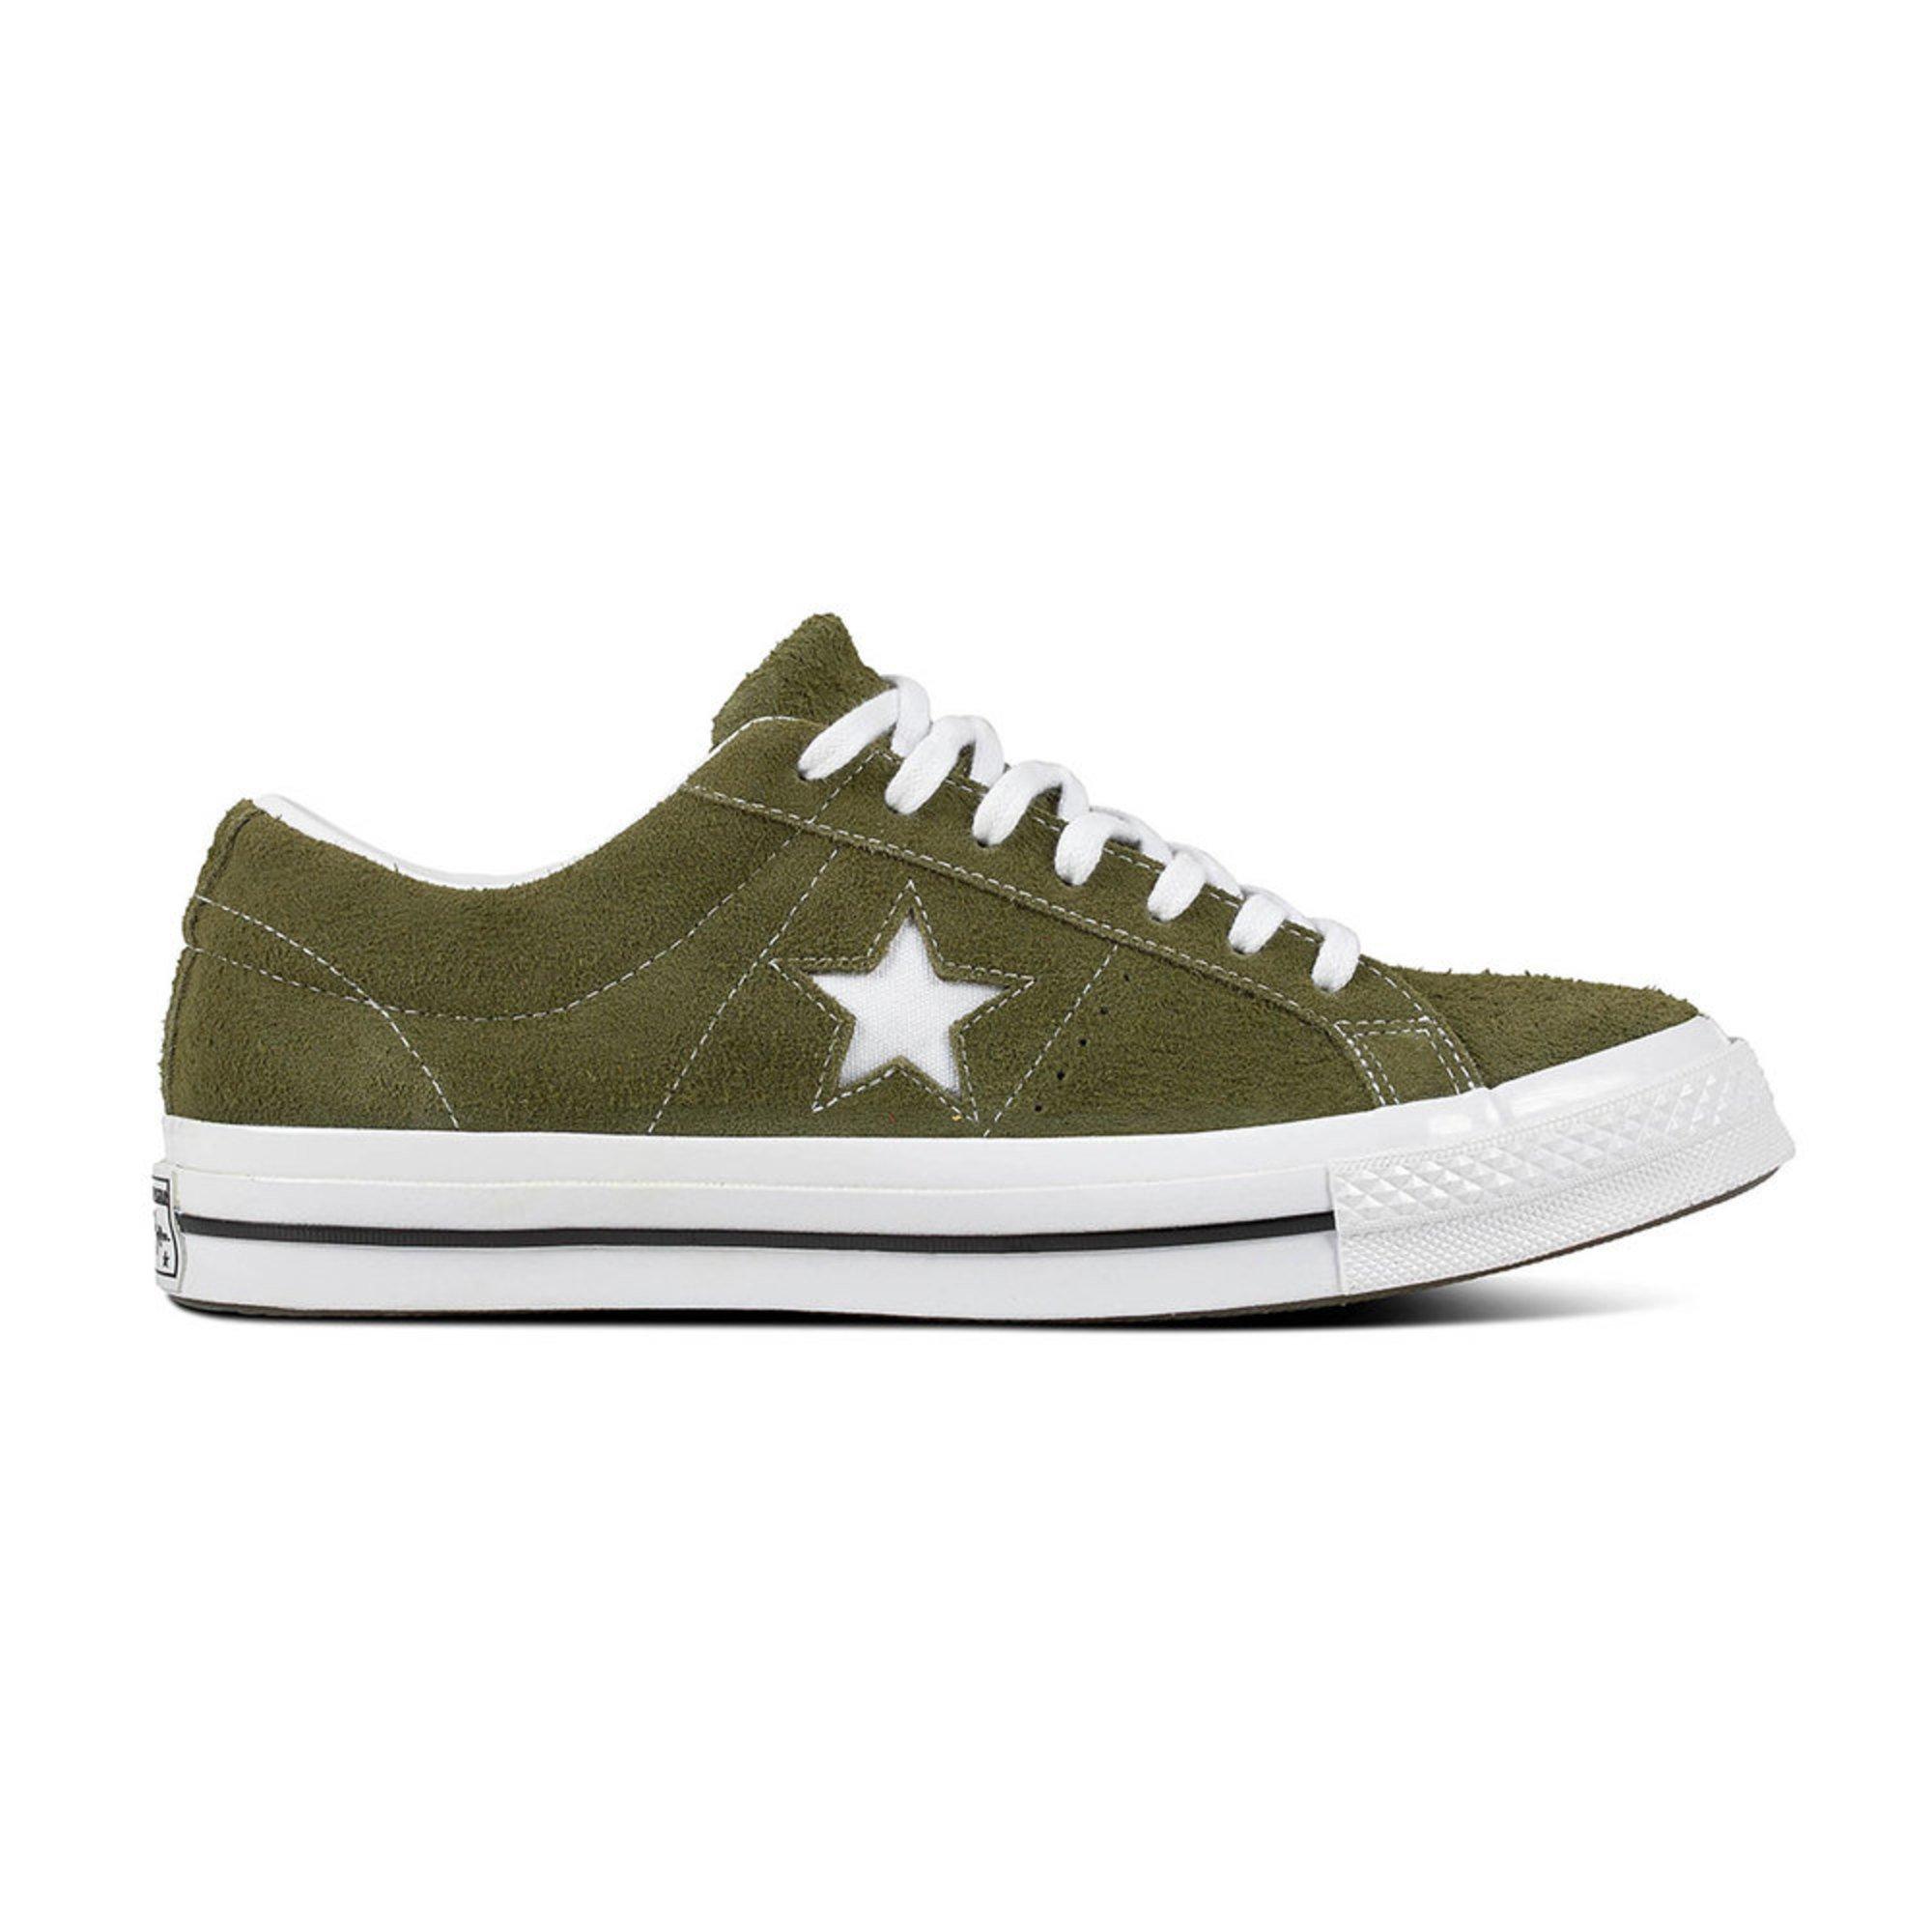 c97ad5fc602f51 Converse. Converse Men s One Star Oxford Skate Shoe